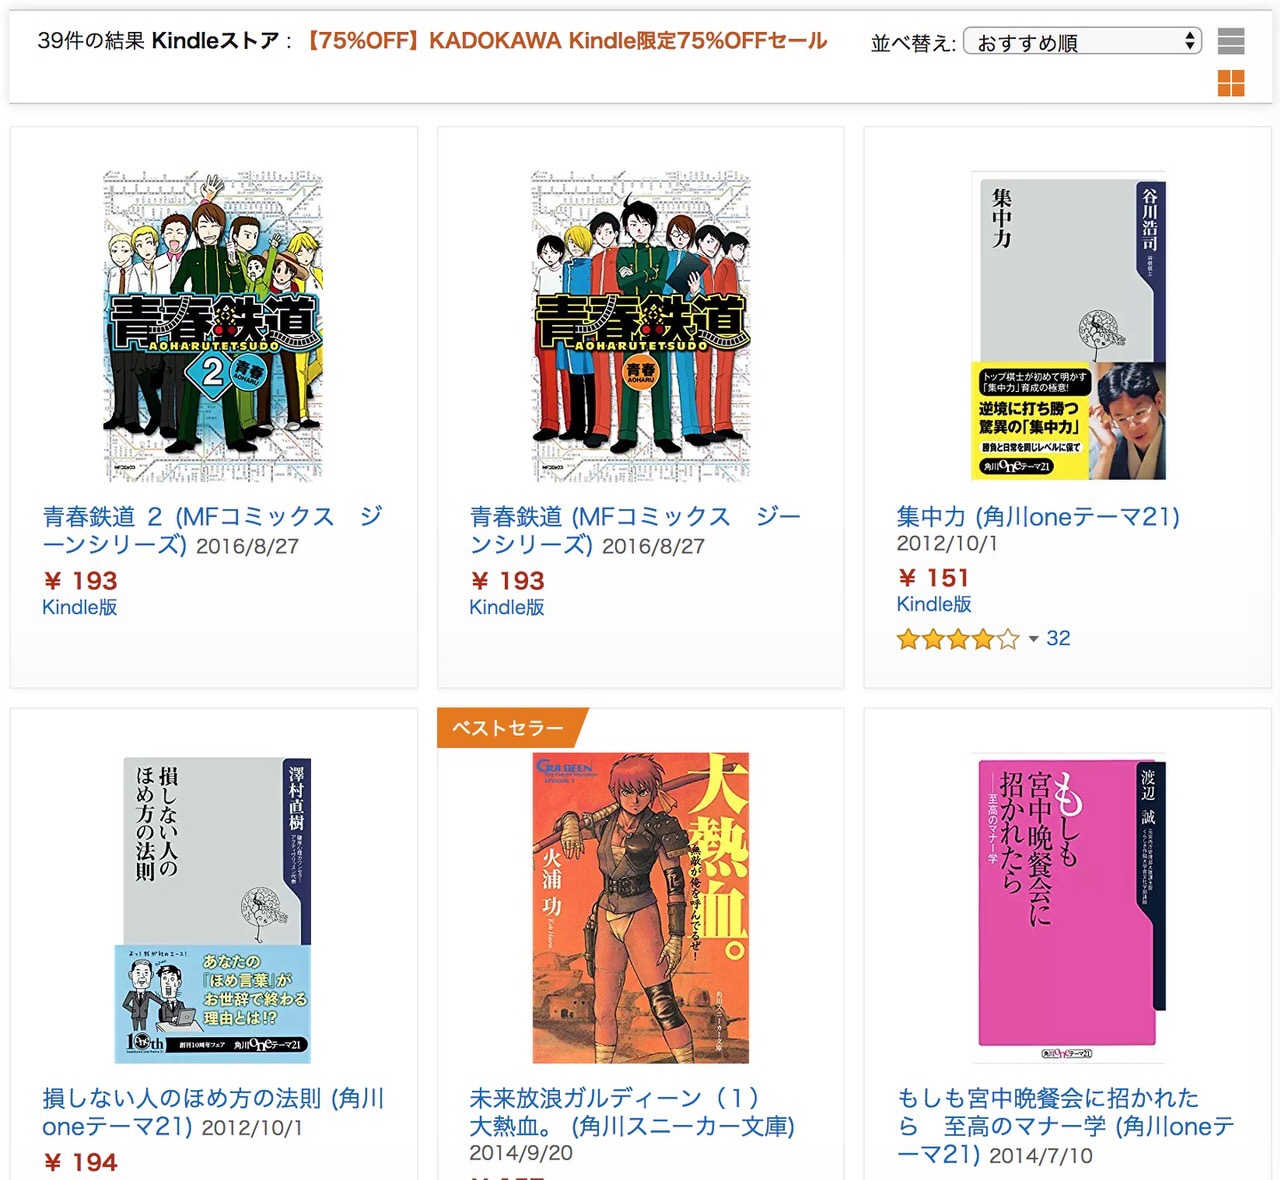 【Kindleセール】KADOKAWA Kindle限定75%OFFセール 〜青春鉄道、損しない人のほめ方の法則など